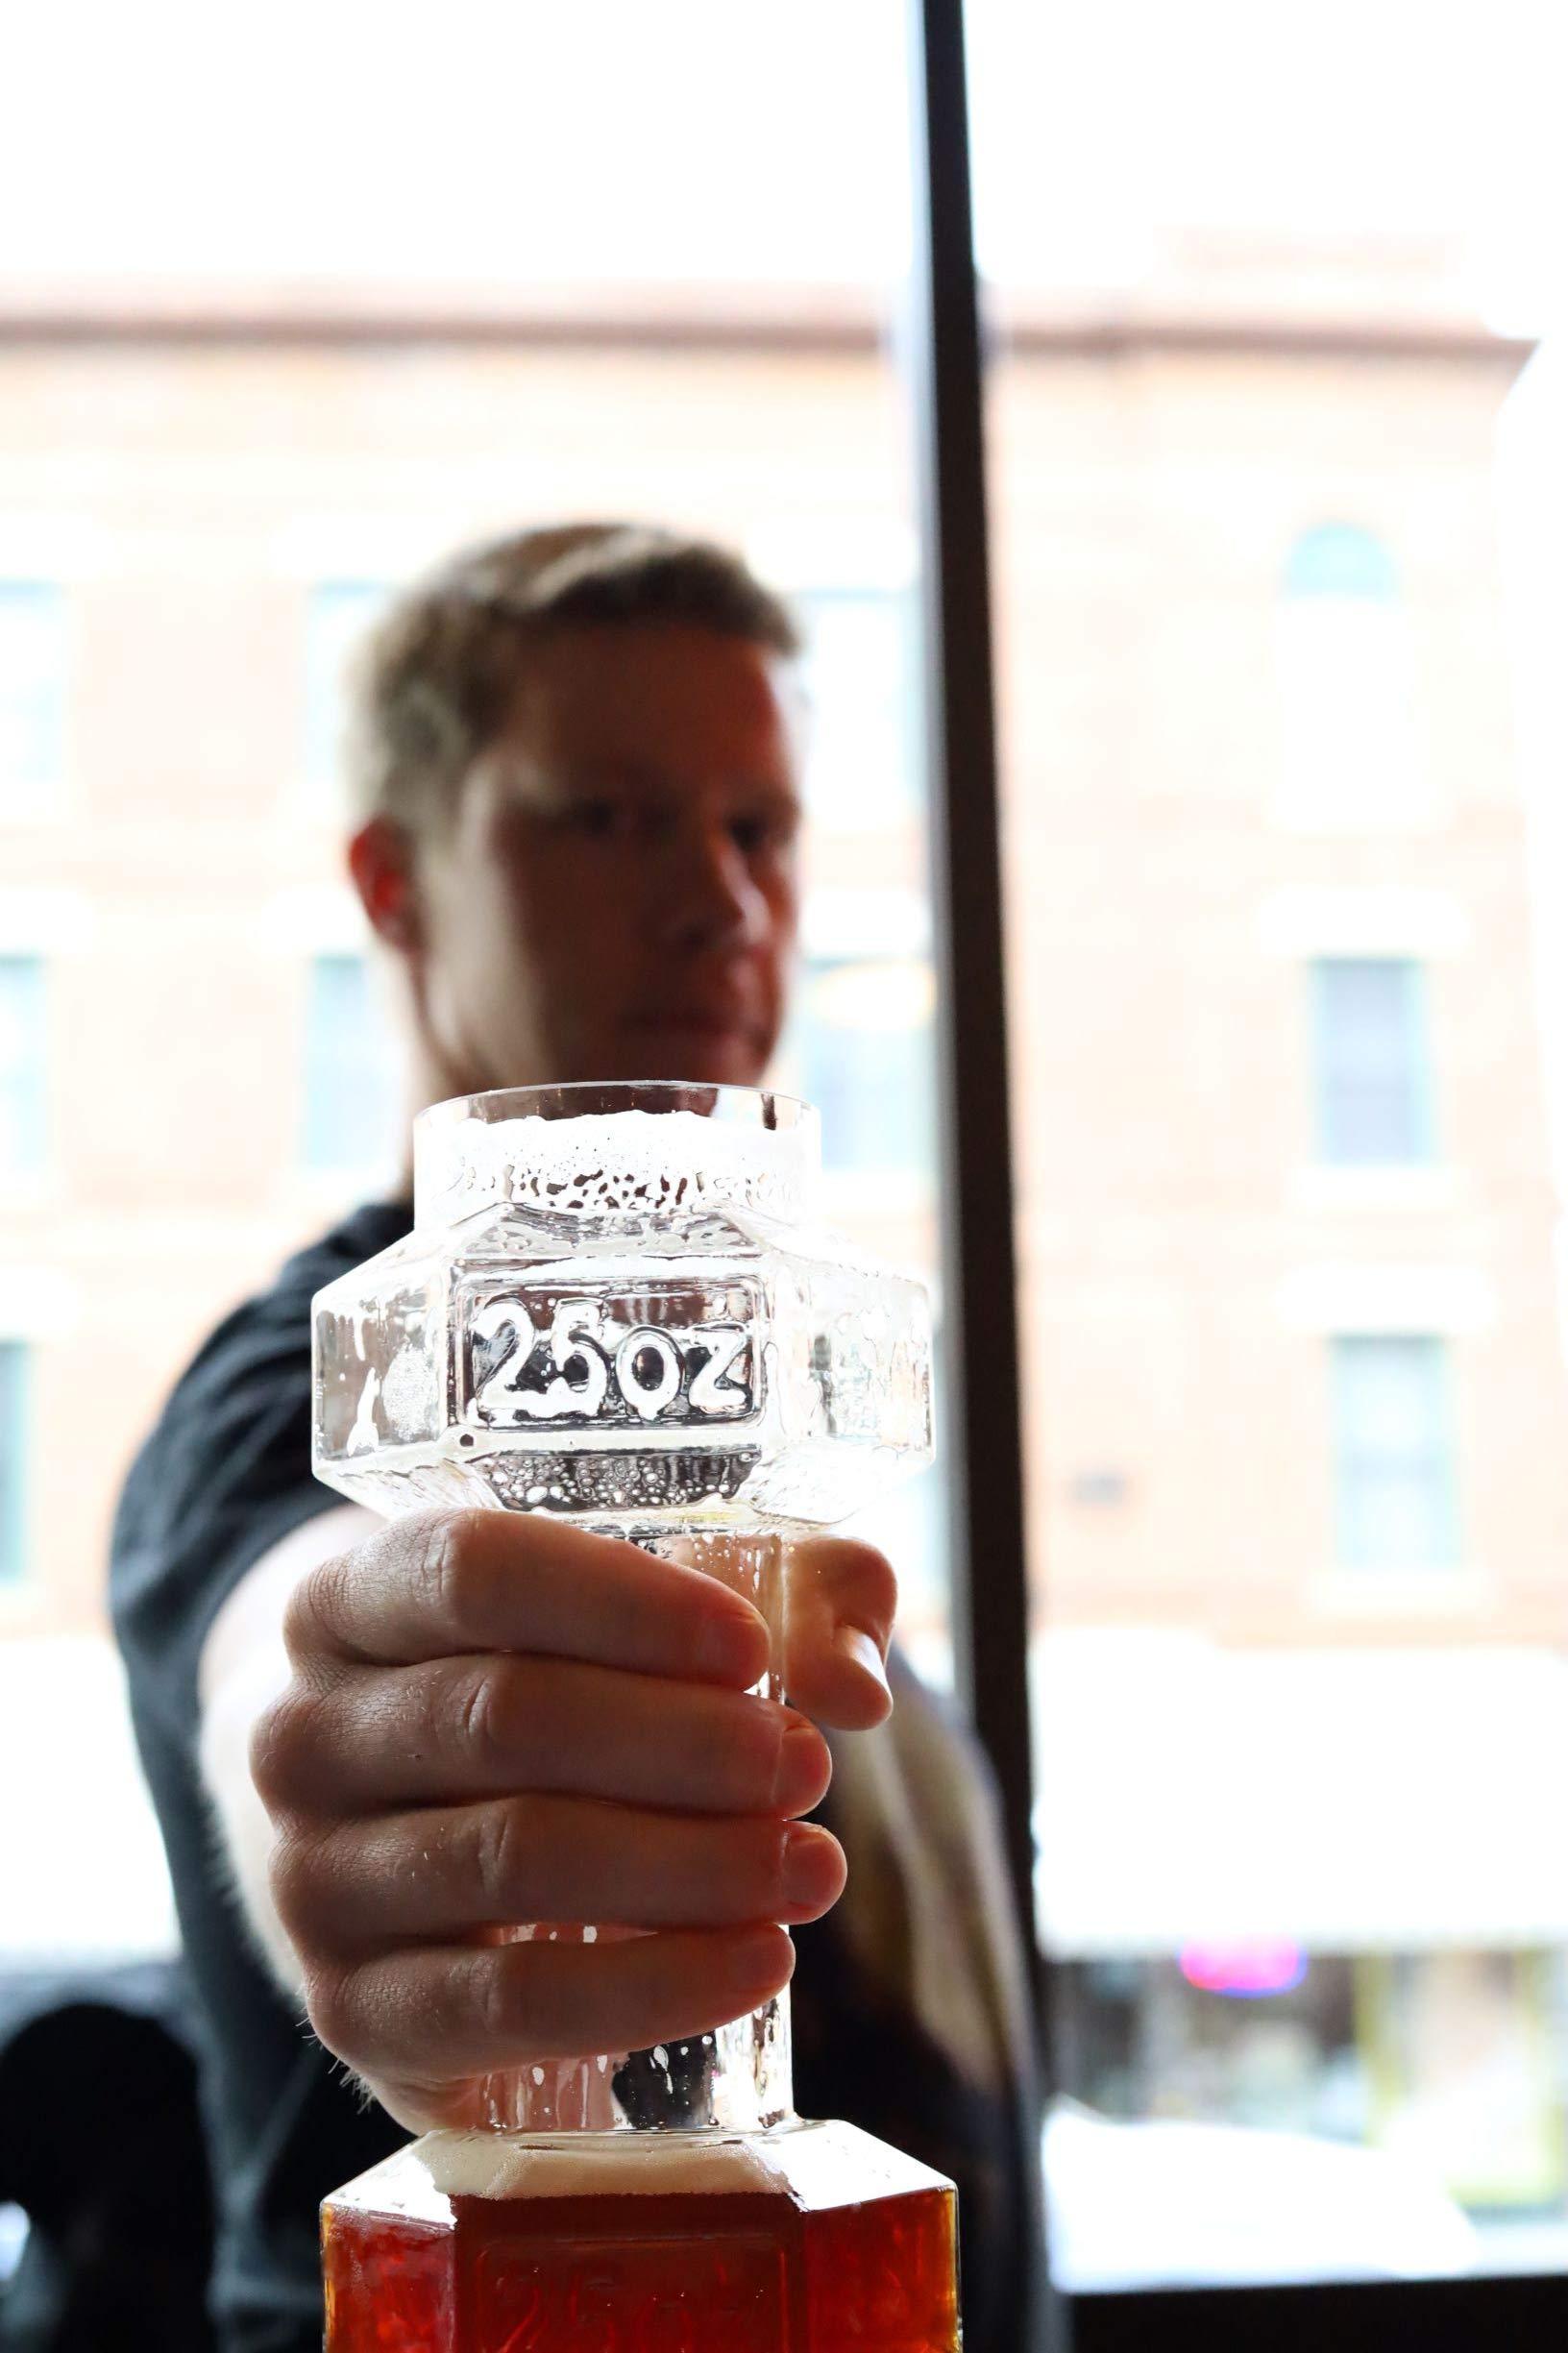 Set of 2, Dumbbell Beer Glasses | Dumbell Beer Glass | Funny Beer Mug | Beer Mugs For Men | Funny Beer Glasses | Beer…